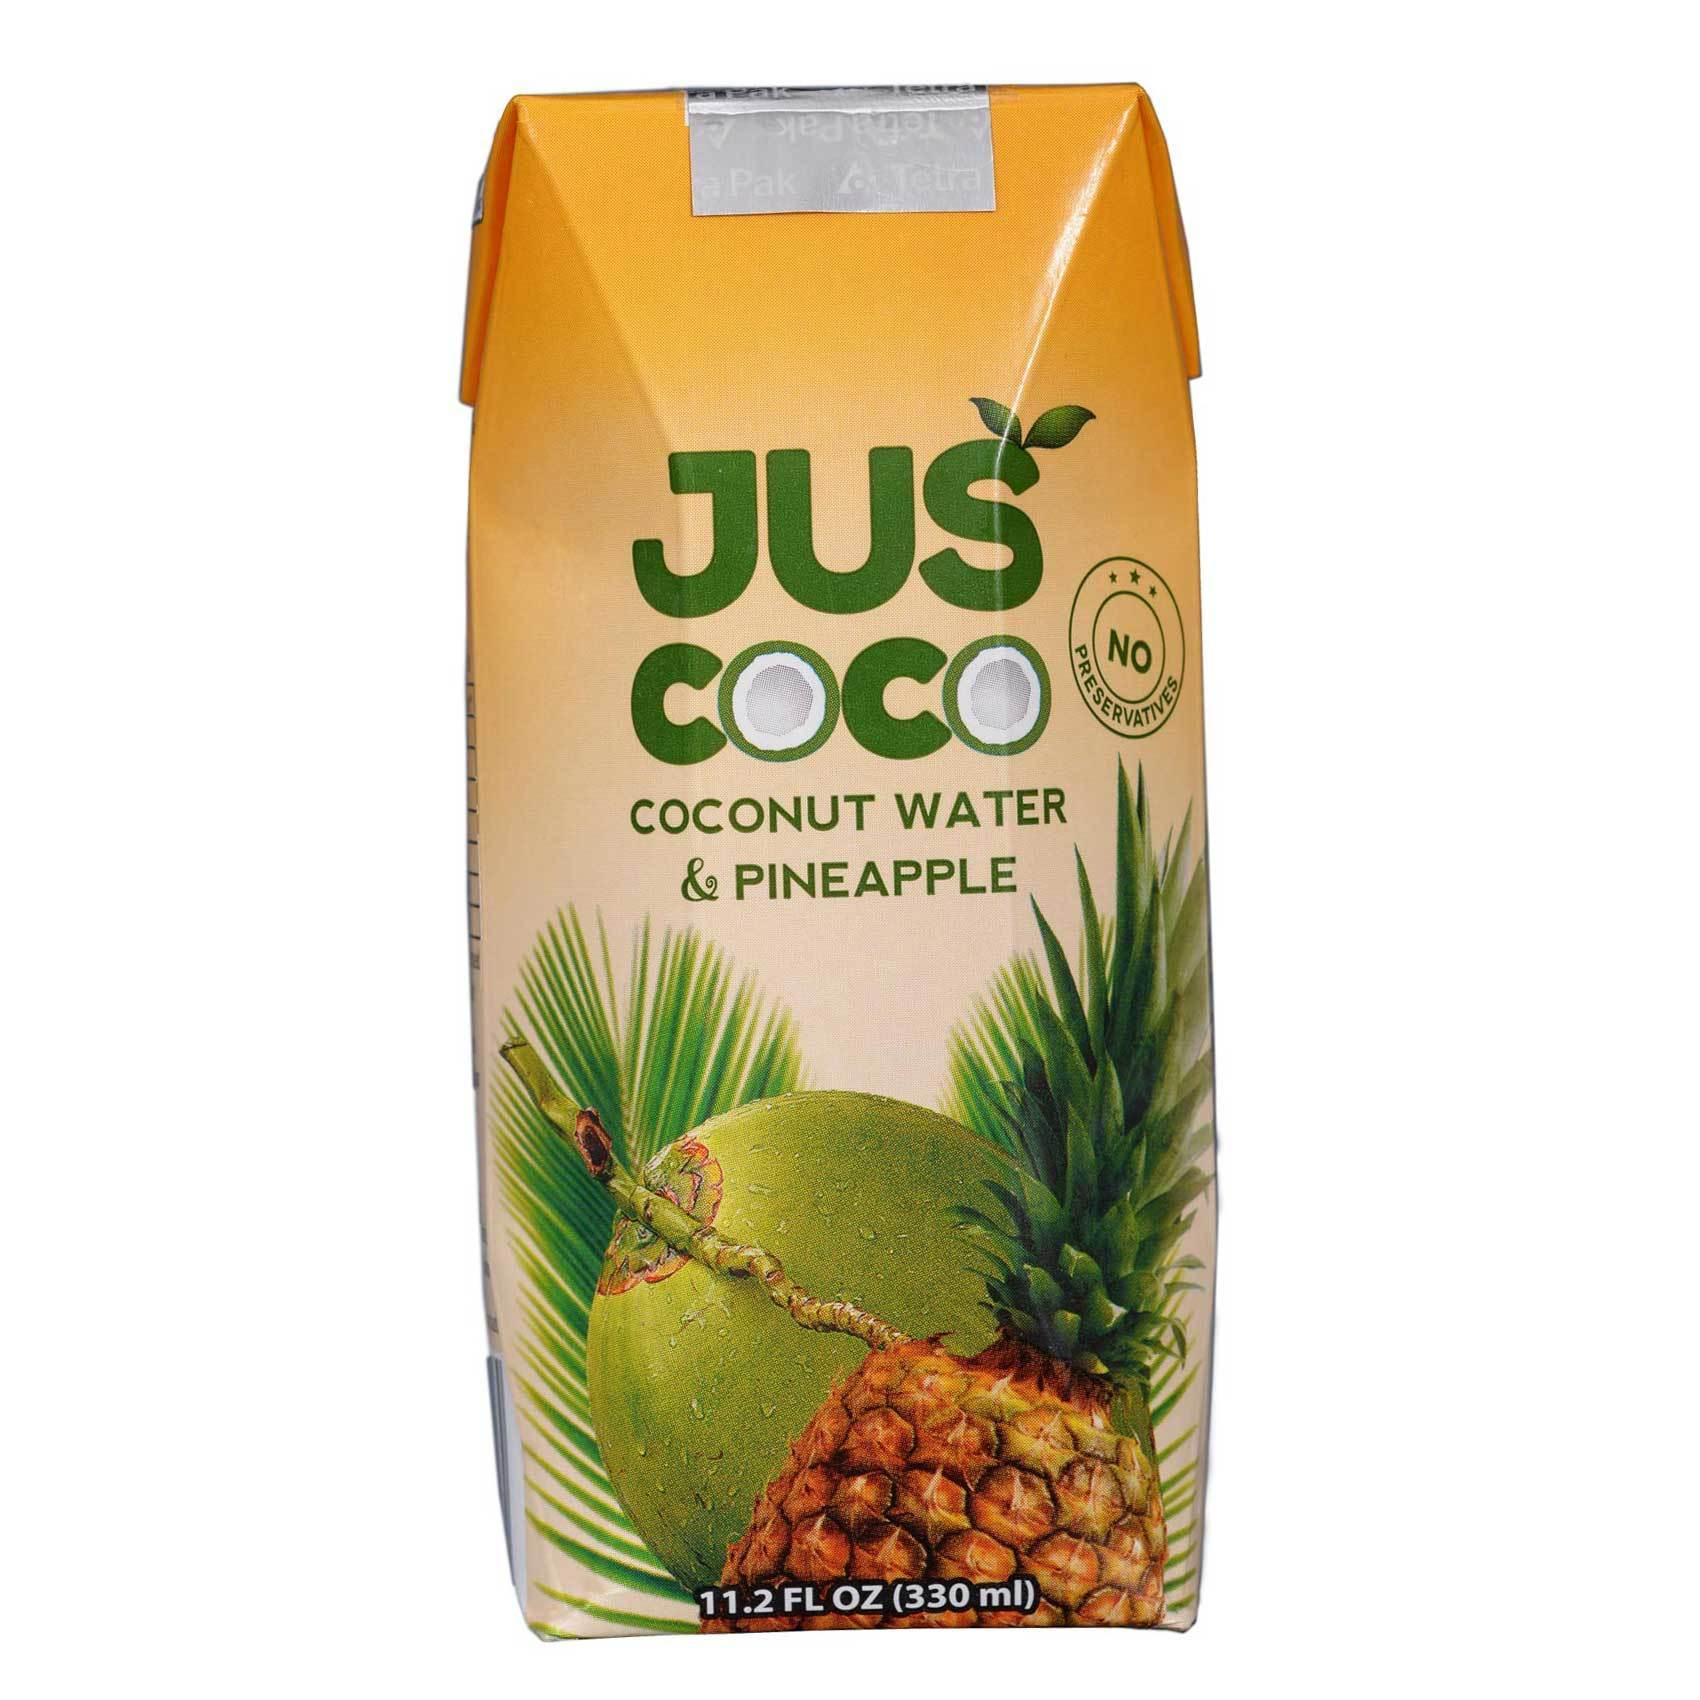 JUSCOCO COCONUT & PINEAPPLE 330ML